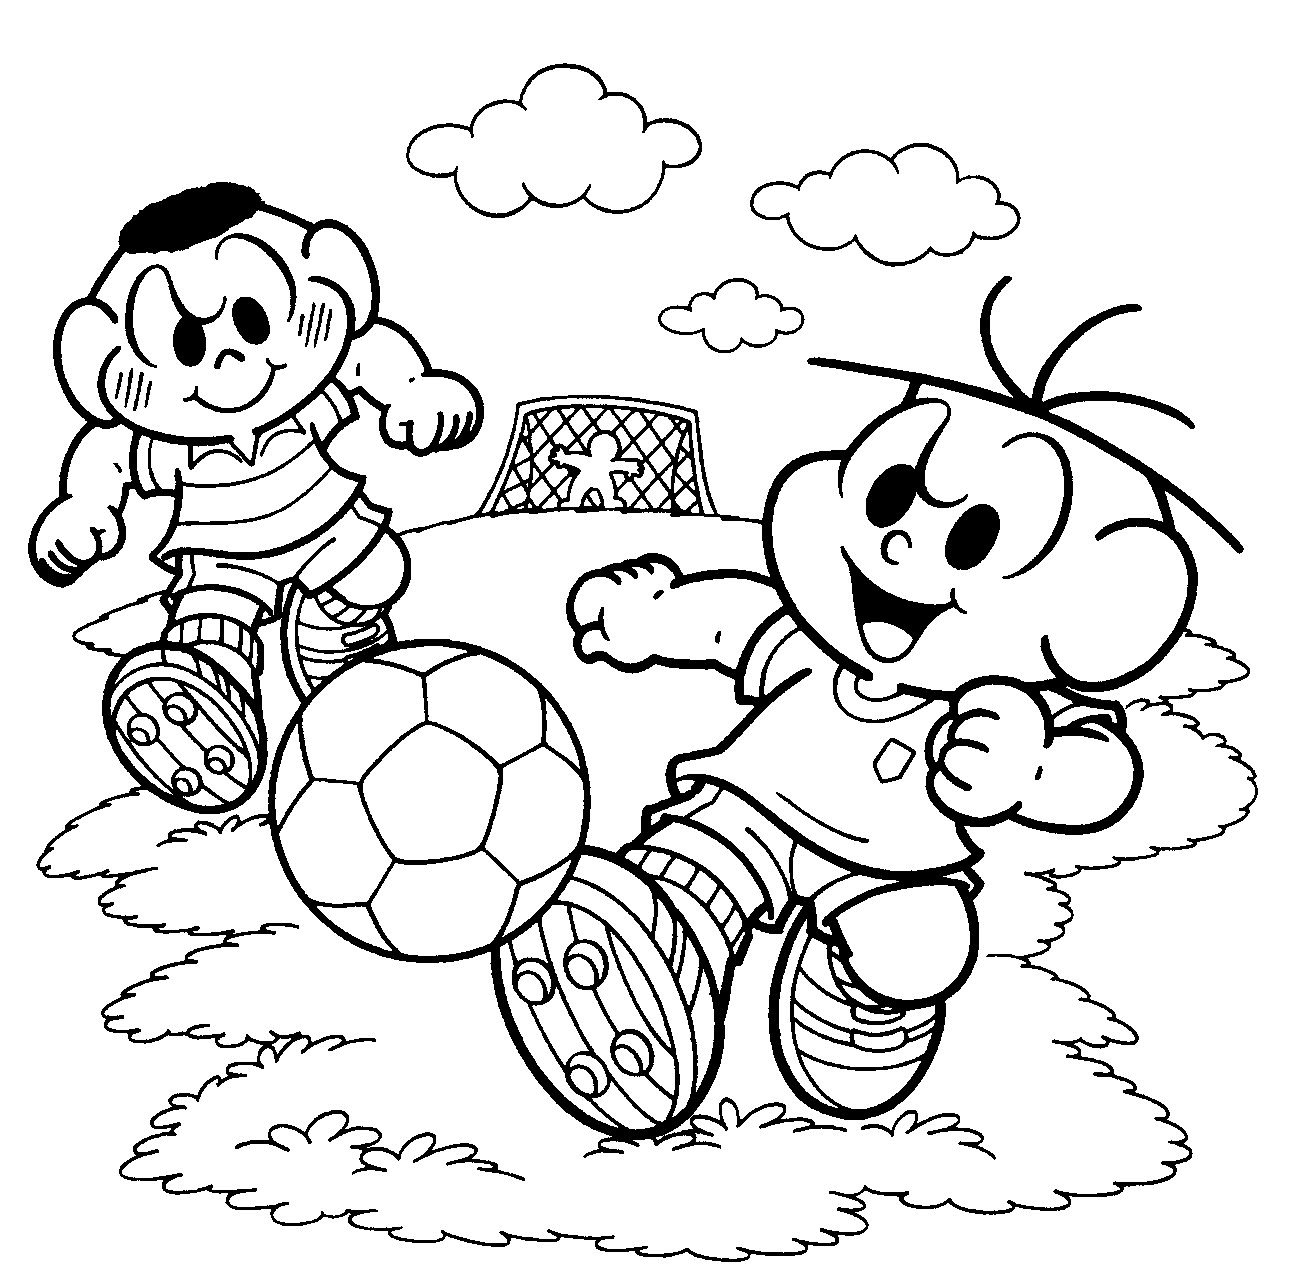 Desenhos Para Imprimir Meninos